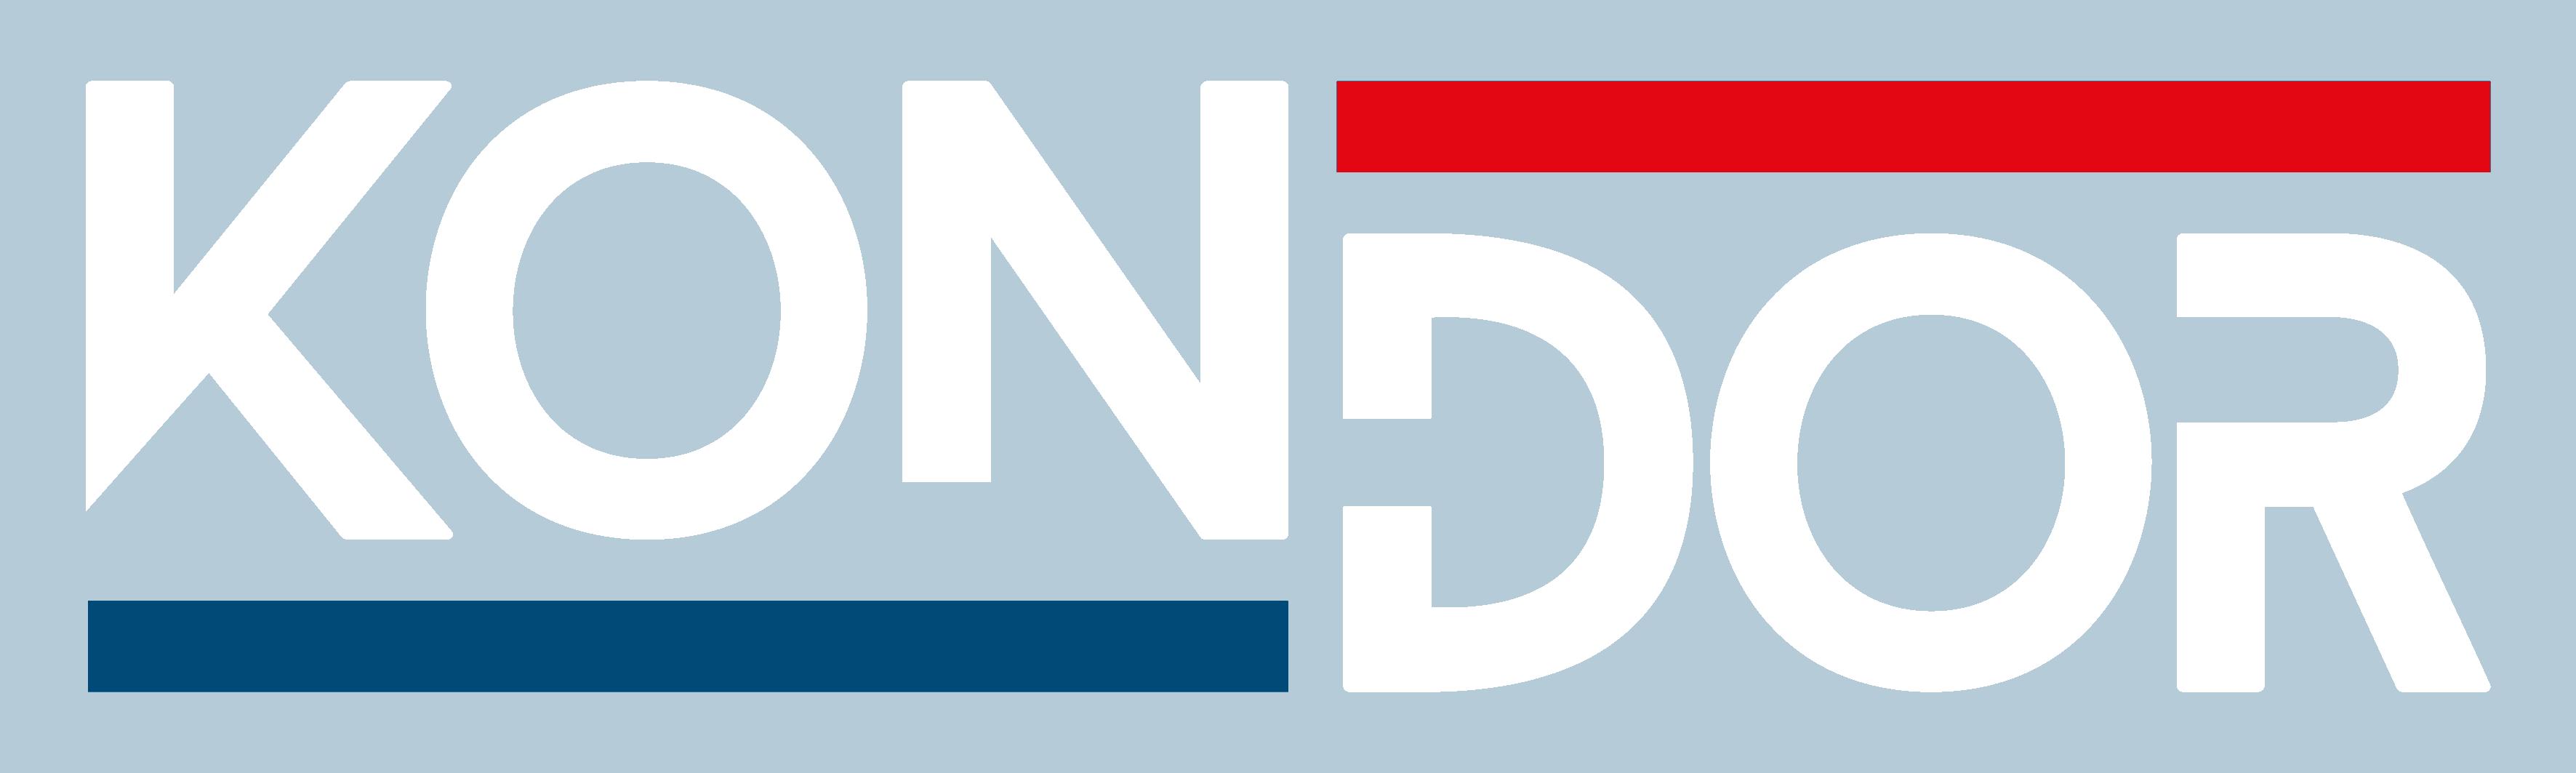 KONDOR Holding logo fehér